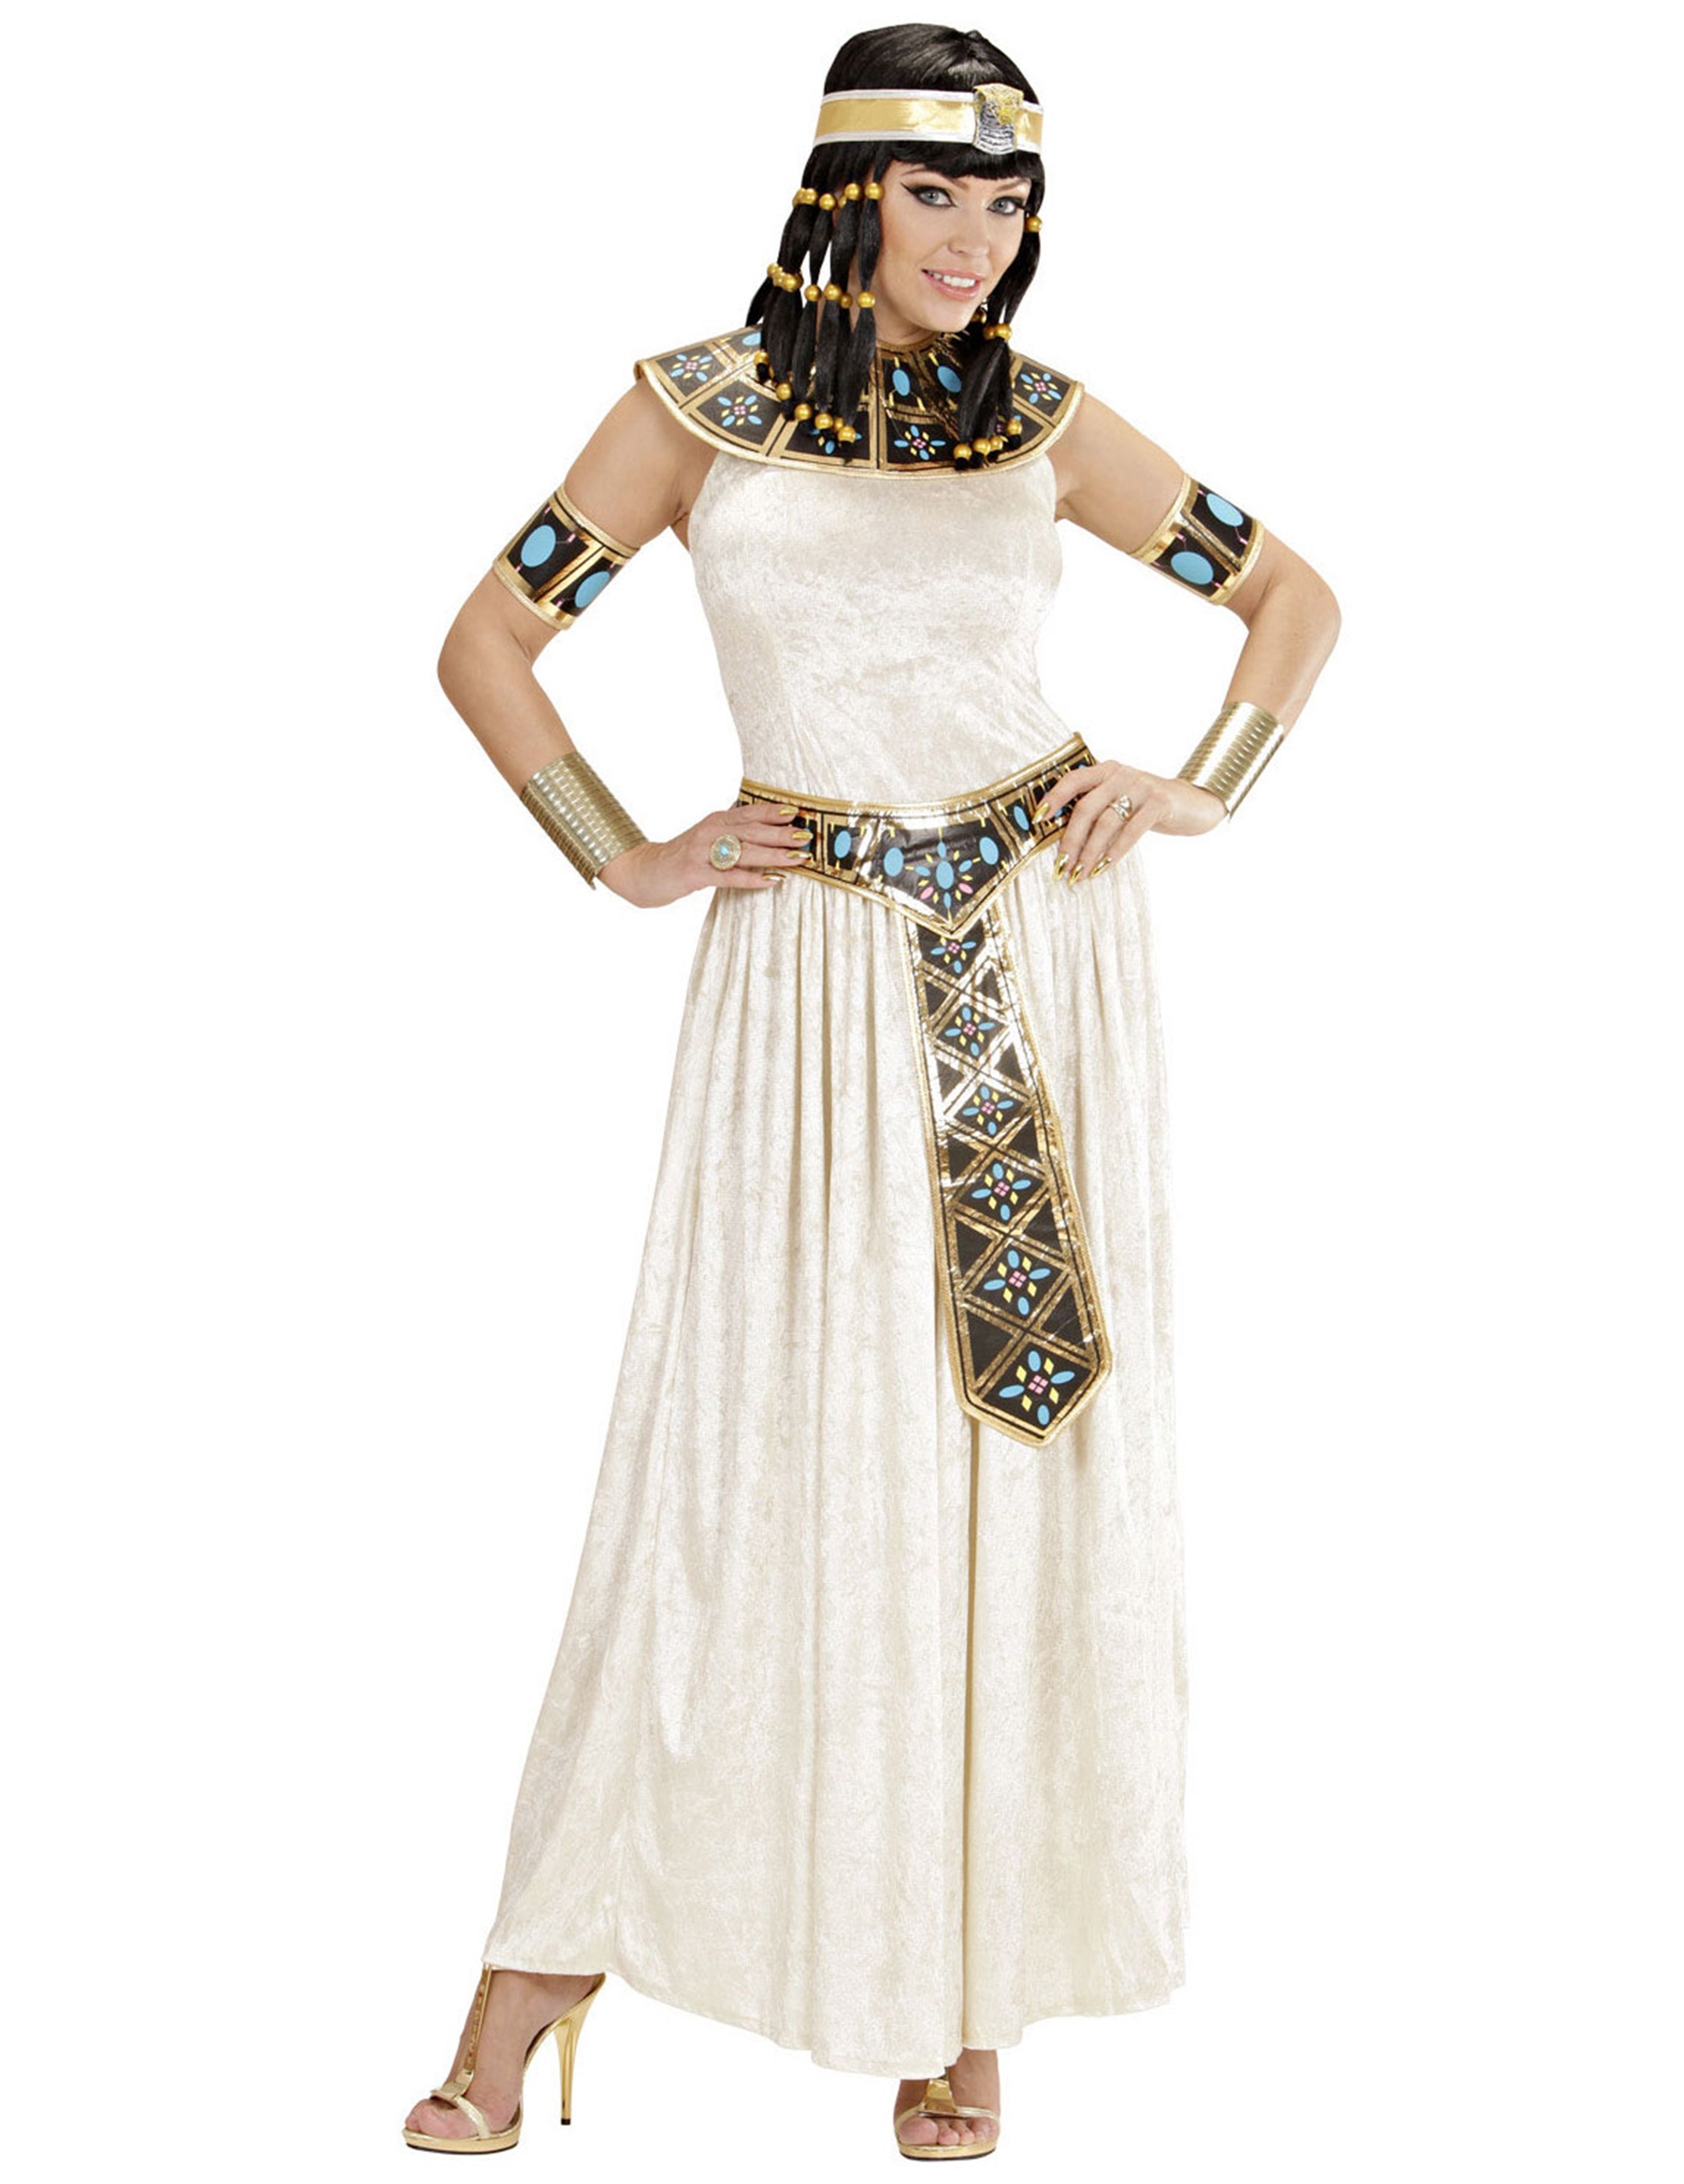 Ägyptische Kaiserin-Kostüm - M 39436